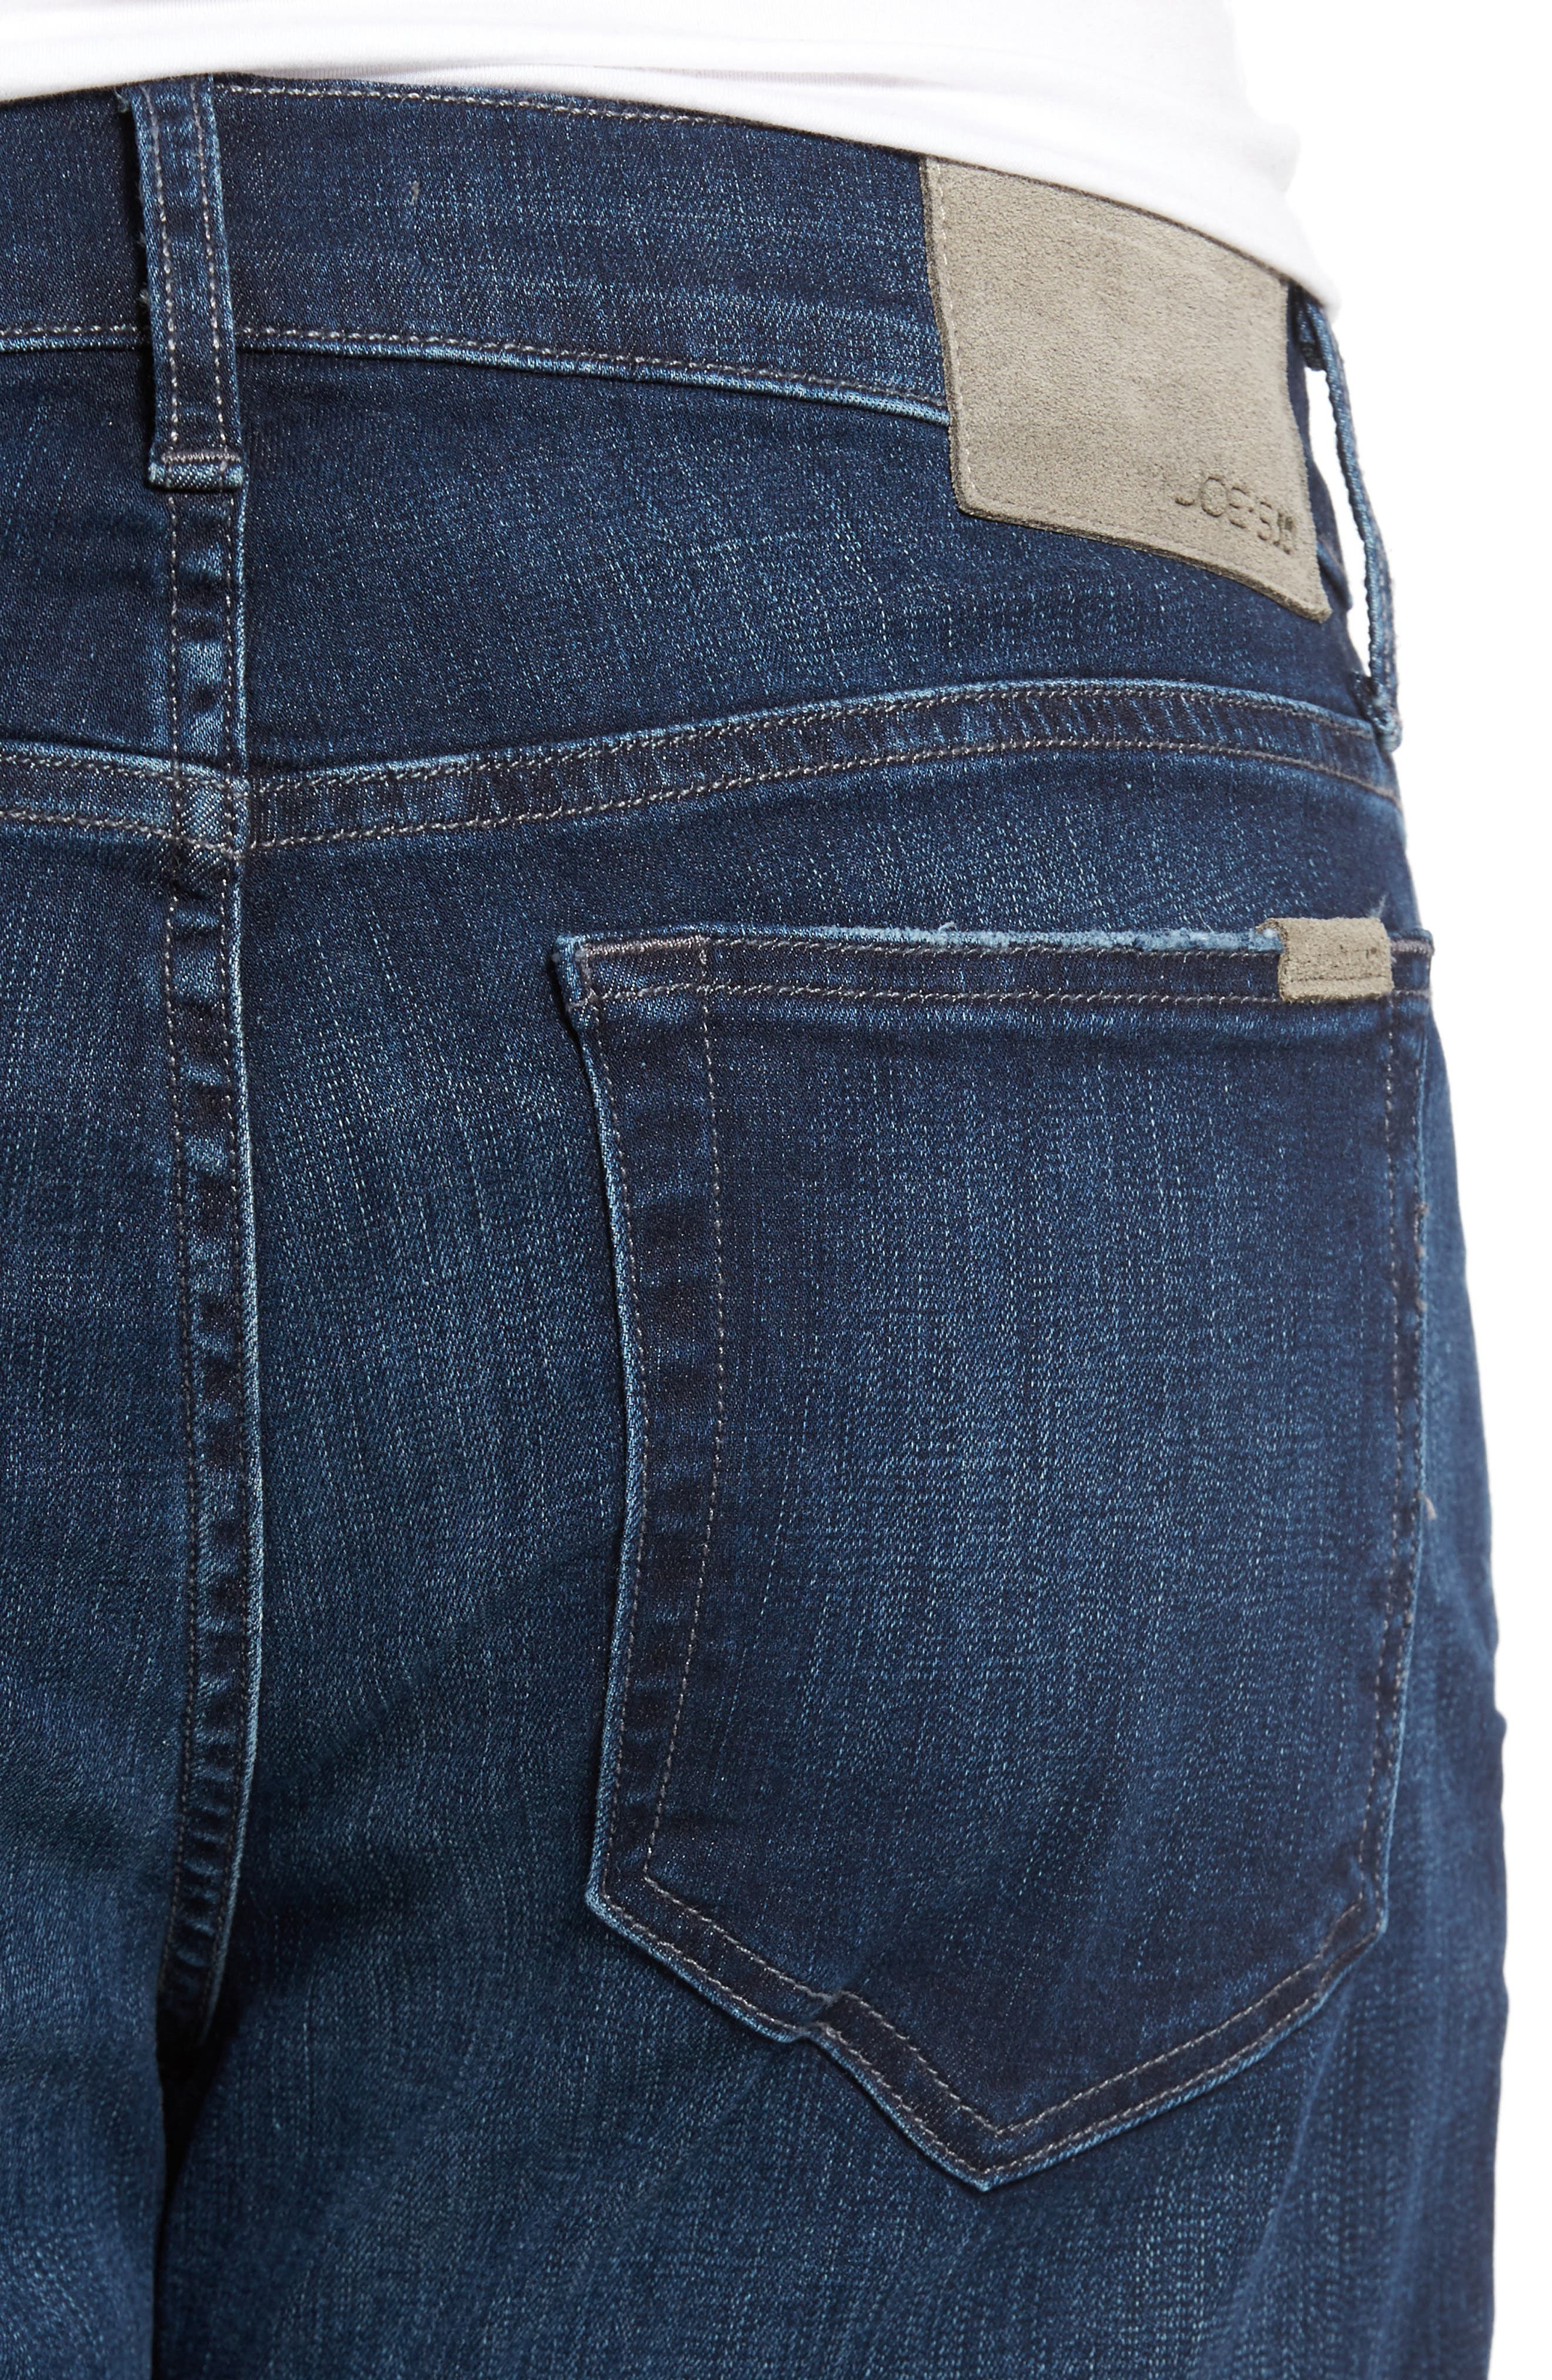 Brixton Kinetic Slim Straight Leg Jeans,                             Alternate thumbnail 4, color,                             Aedan